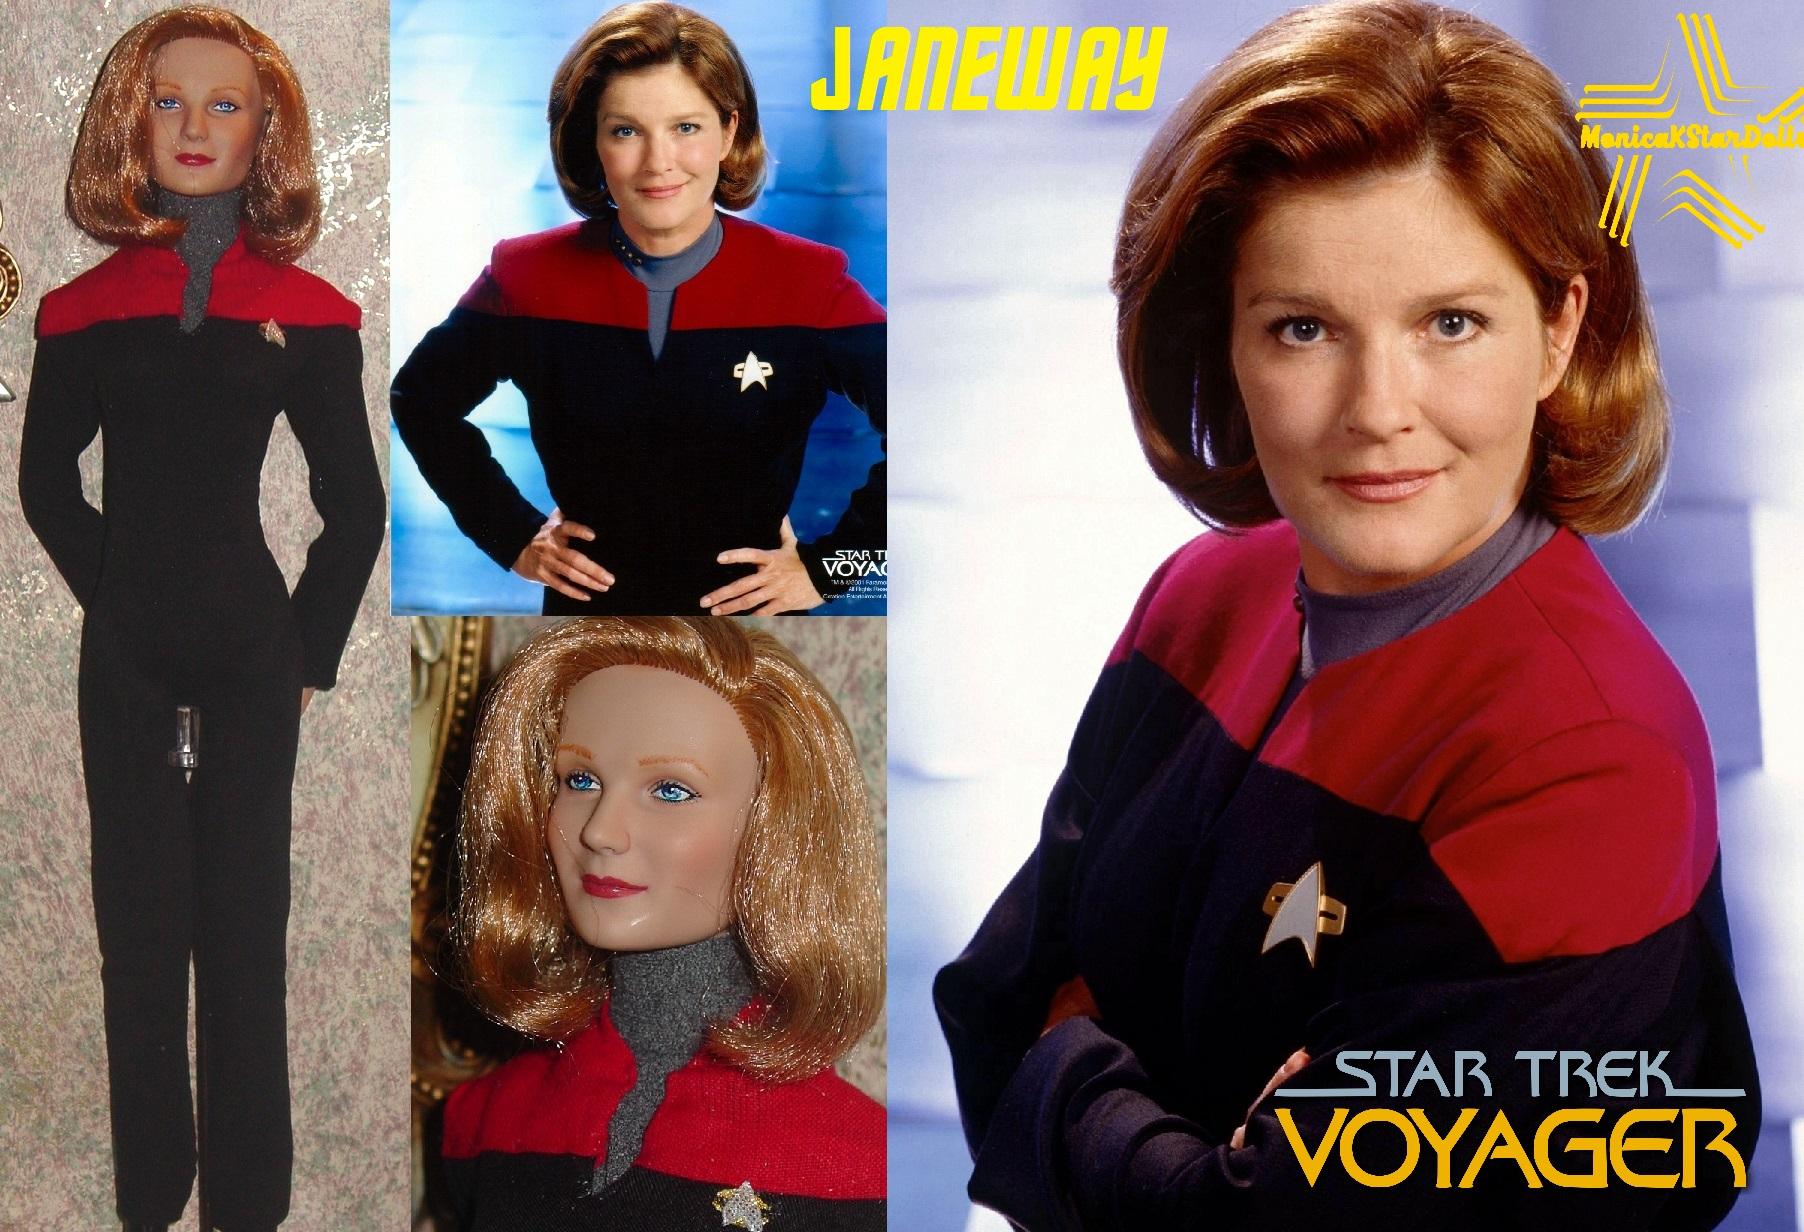 Cap. Janeway